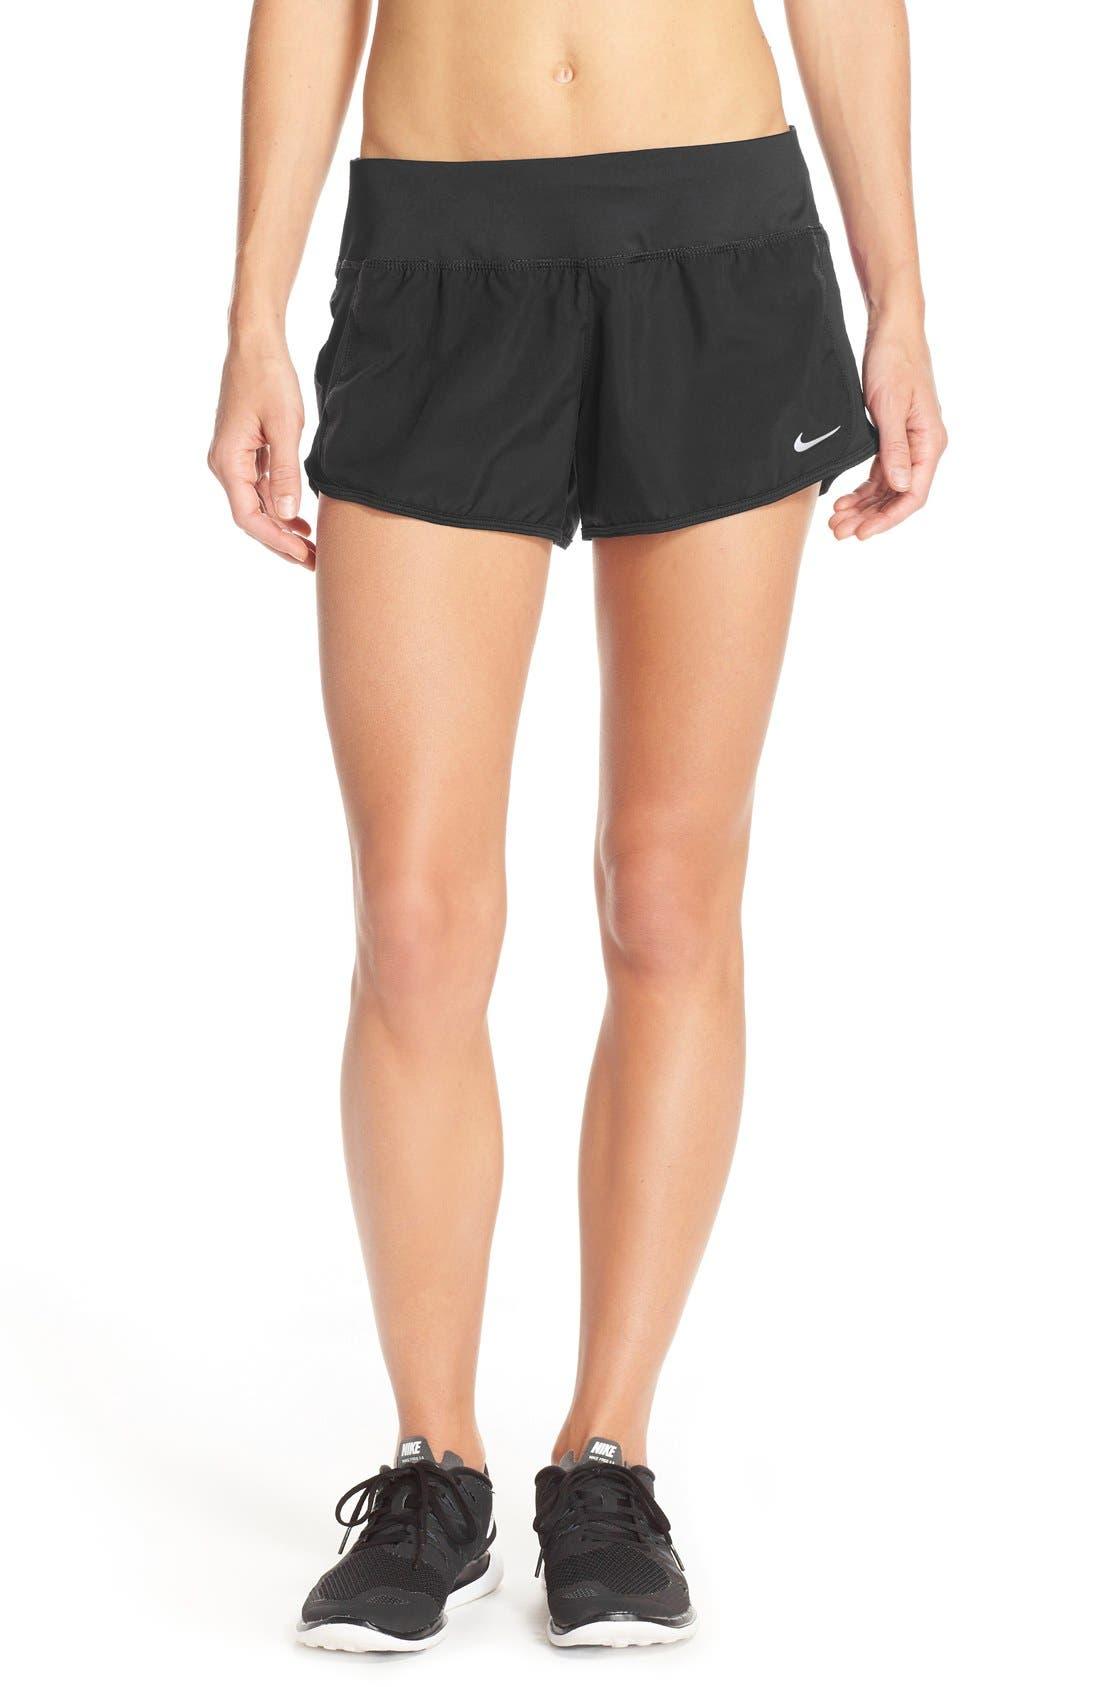 NIKE 'Crew' Dri-FIT Running Shorts, Main, color, 001